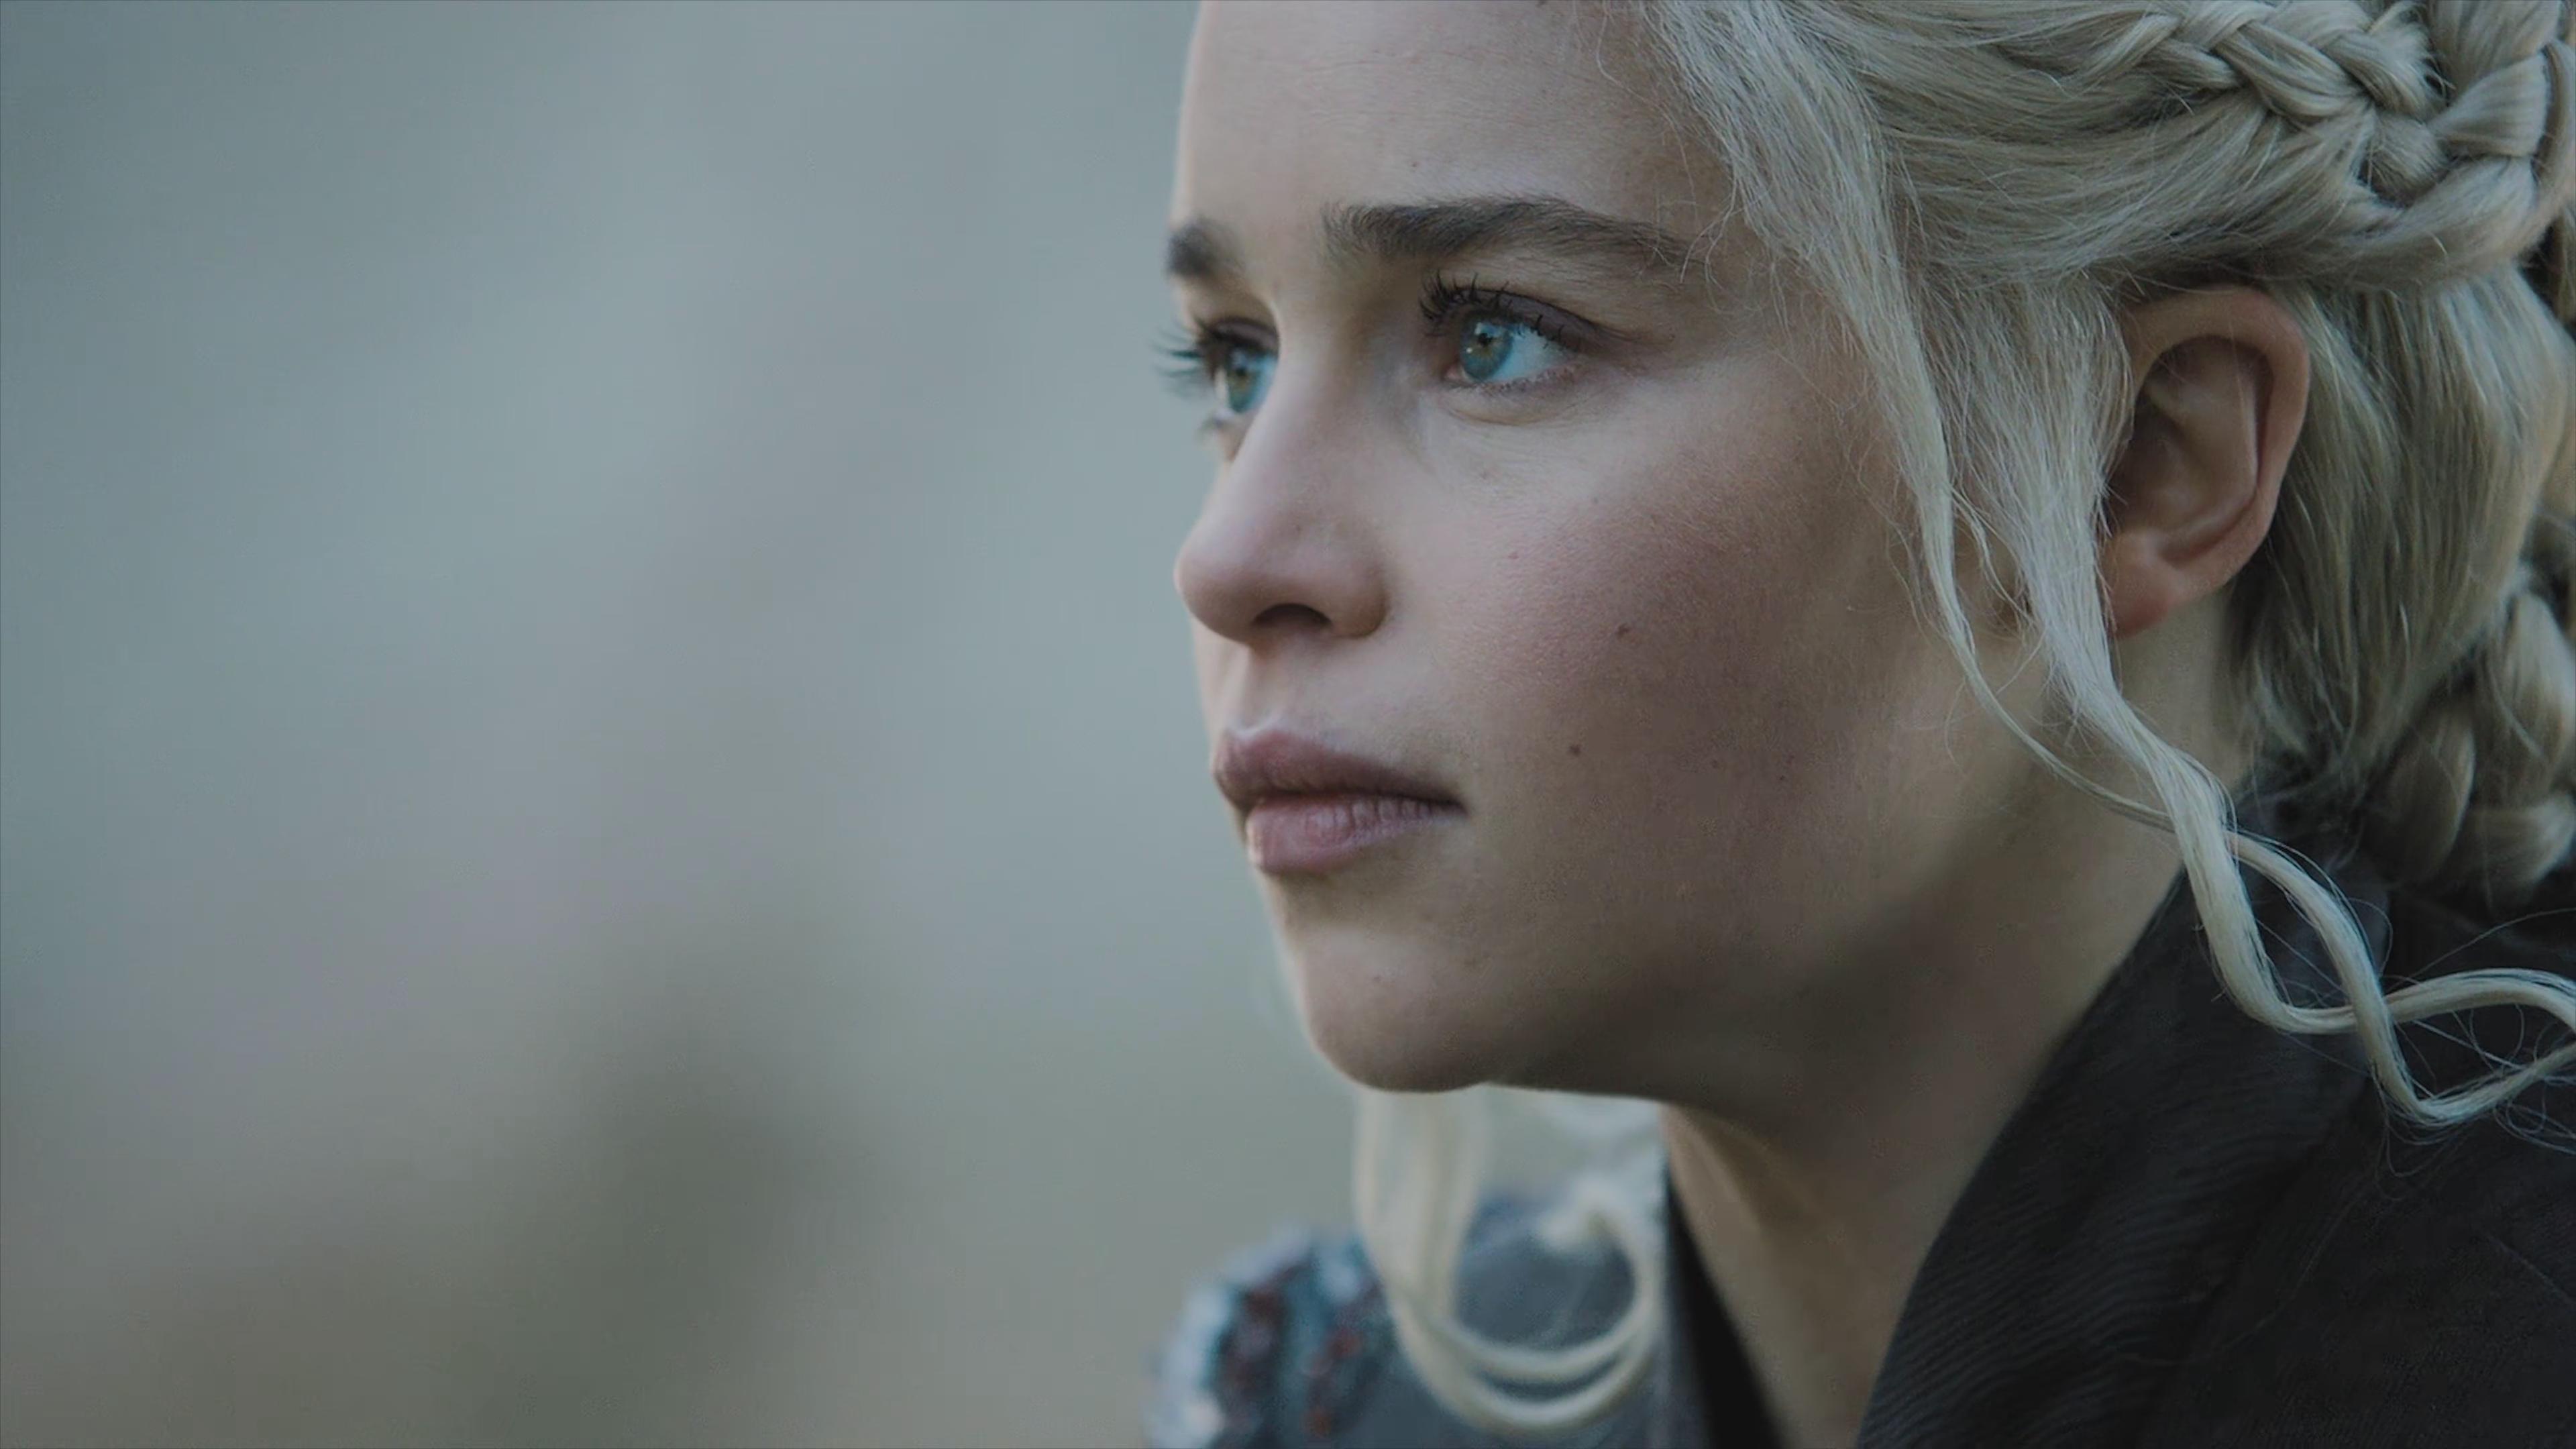 Beautiful Wallpaper With Dany 4k Daenerys Targaryen Sinema 14 Nisan